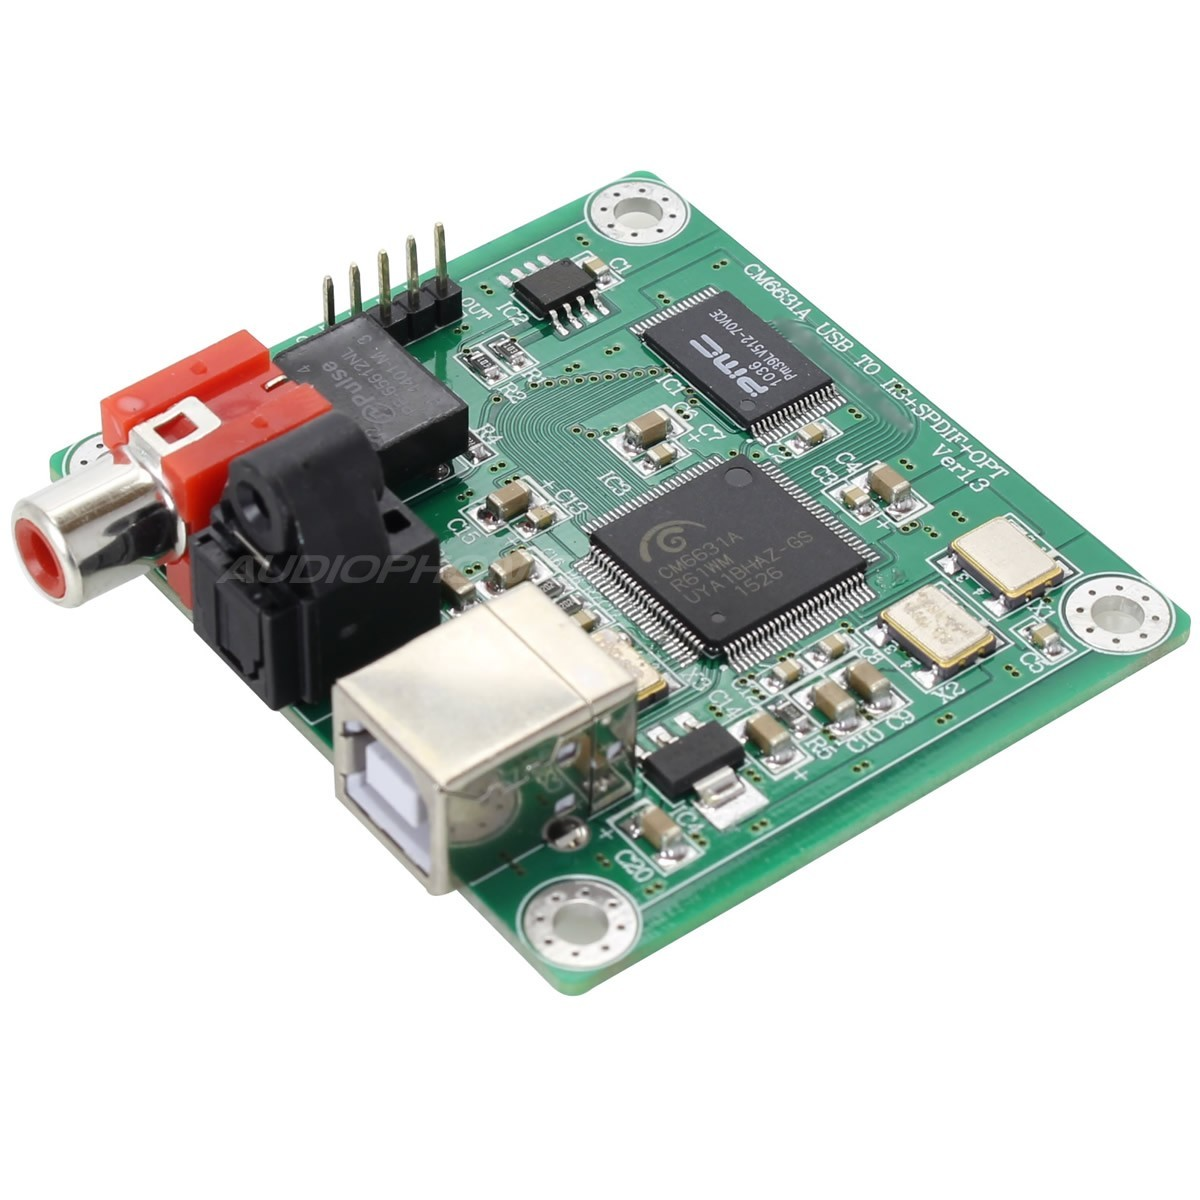 LJ CM6631A V 1.3 USB to I2S / SPDIF interface 24bit / 192kHz